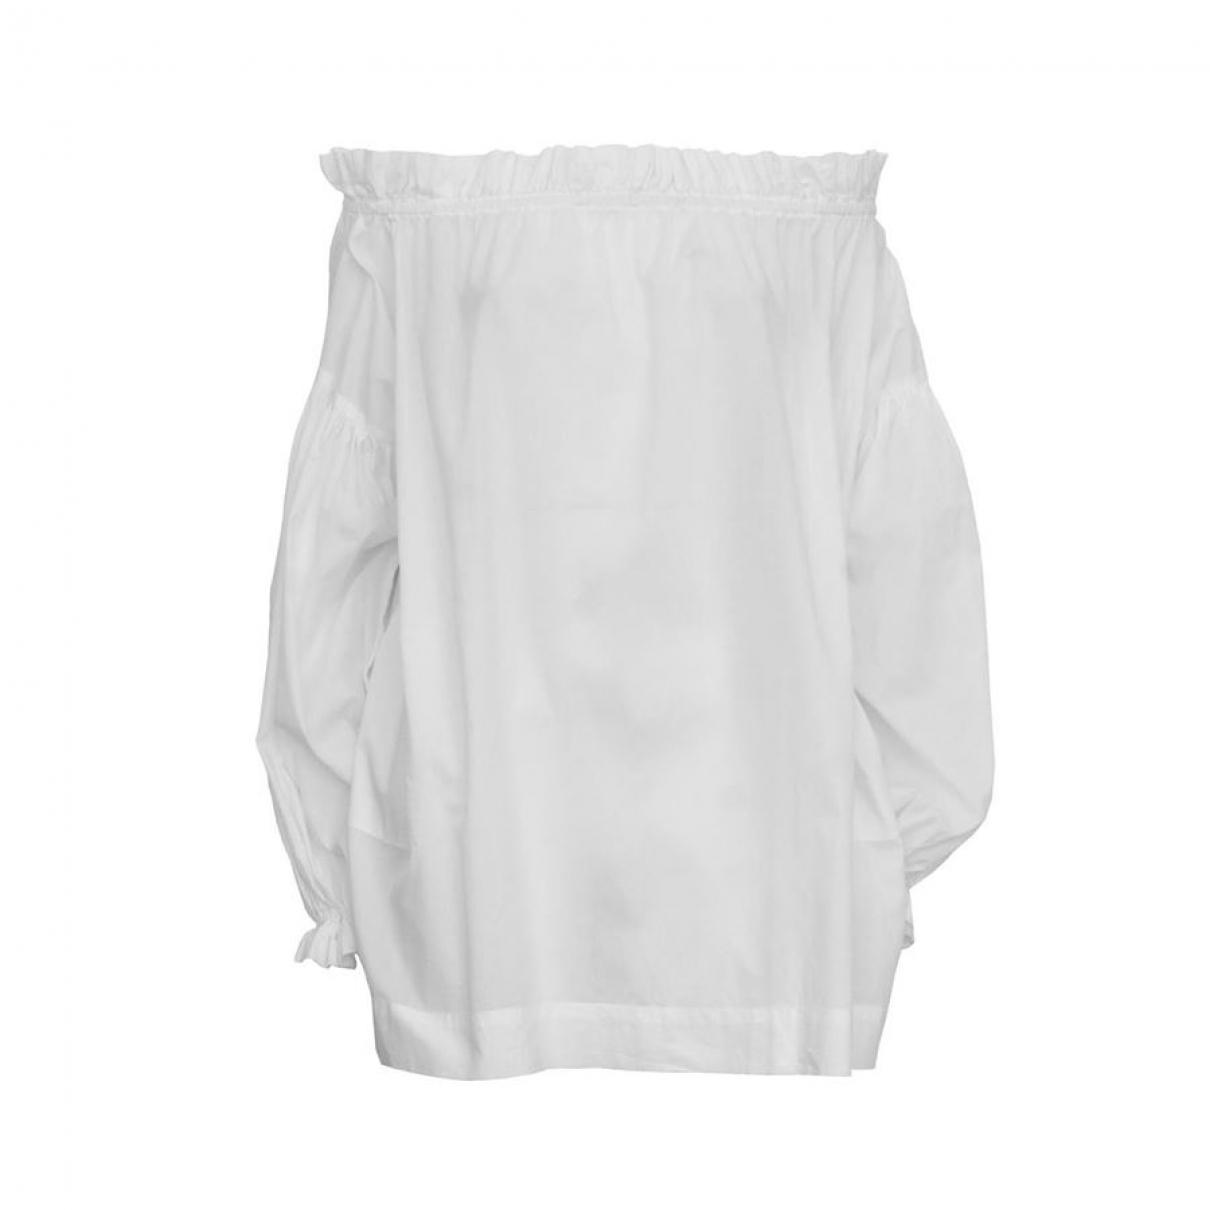 Vivienne Westwood \N White Cotton  top for Women 40 IT